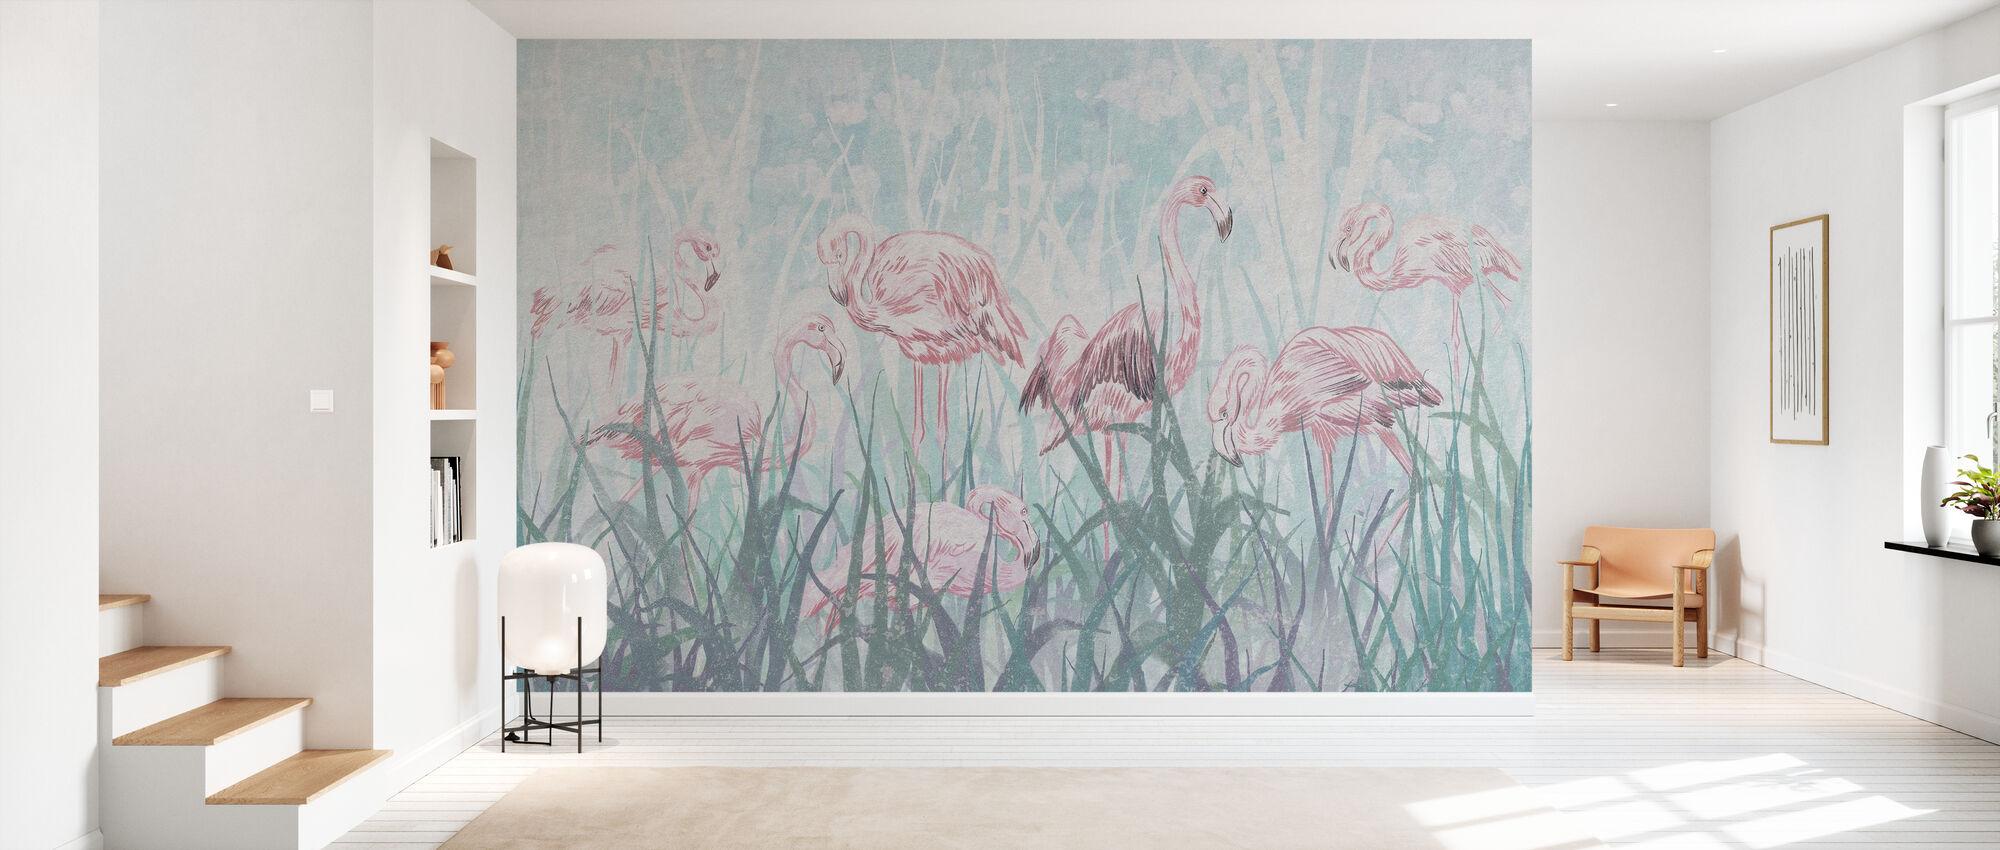 Flamingos in the Grass - Wallpaper - Hallway